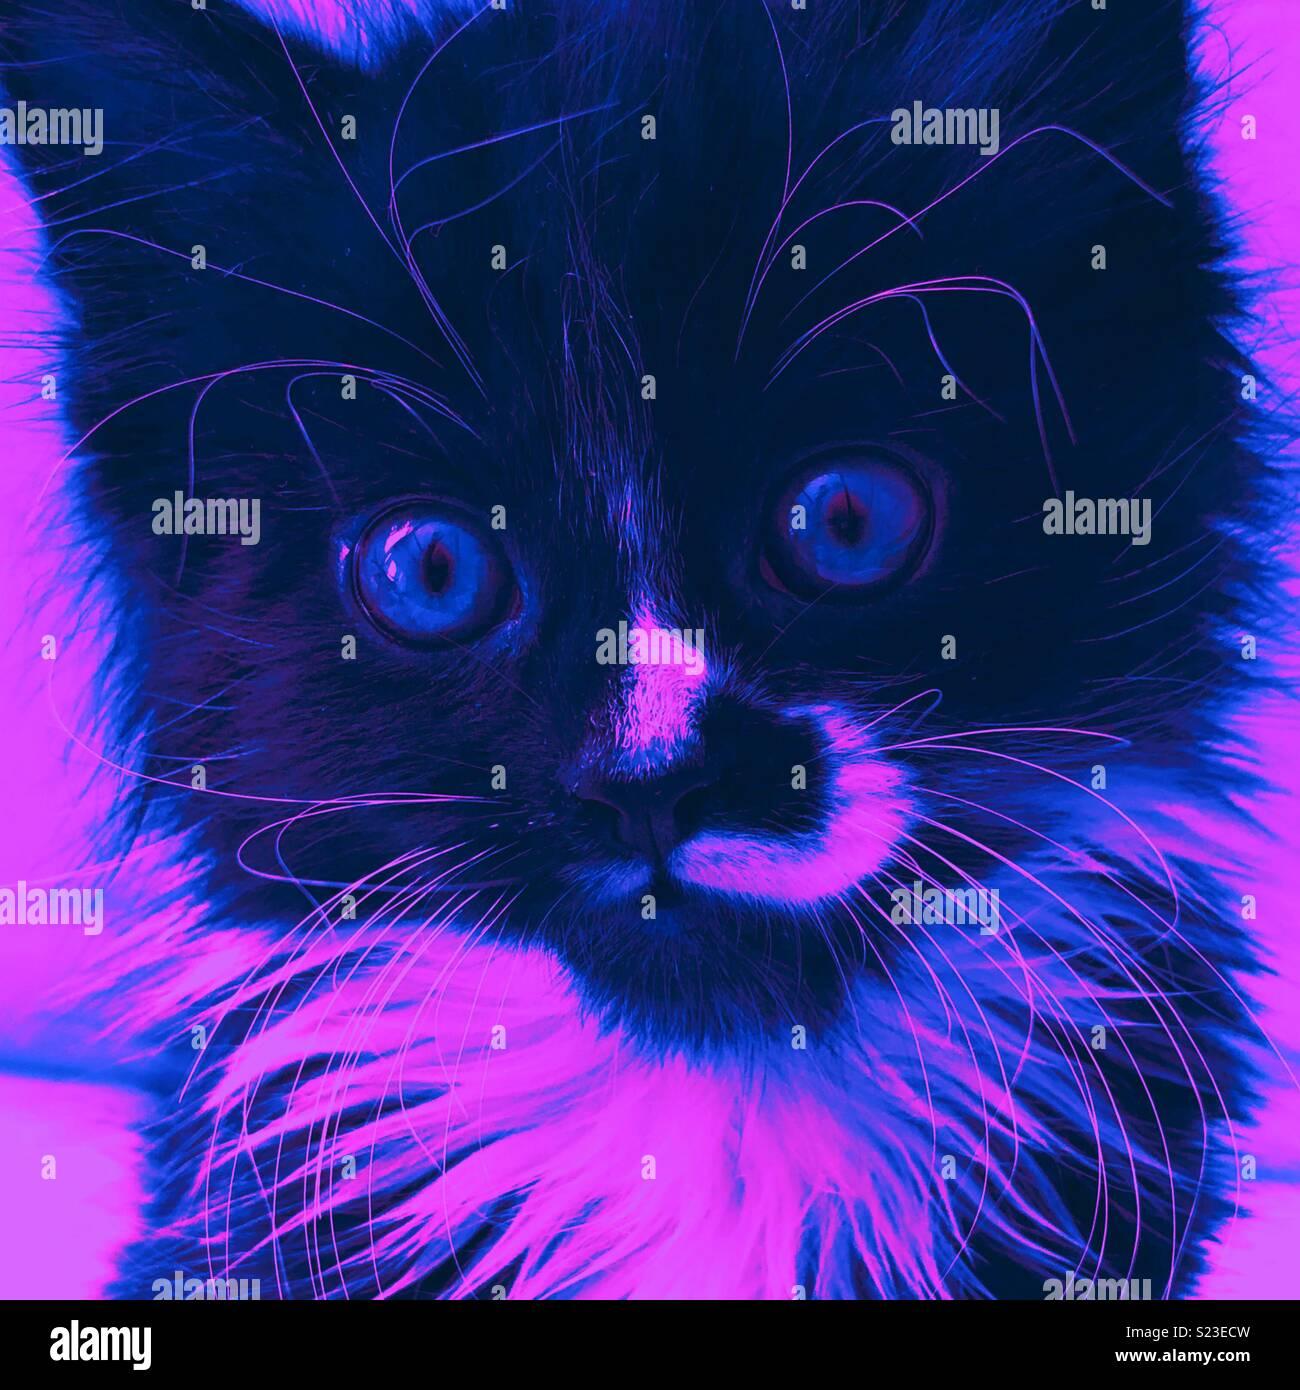 Cerca de un gatito en color púrpura estilo Pop Art Foto de stock